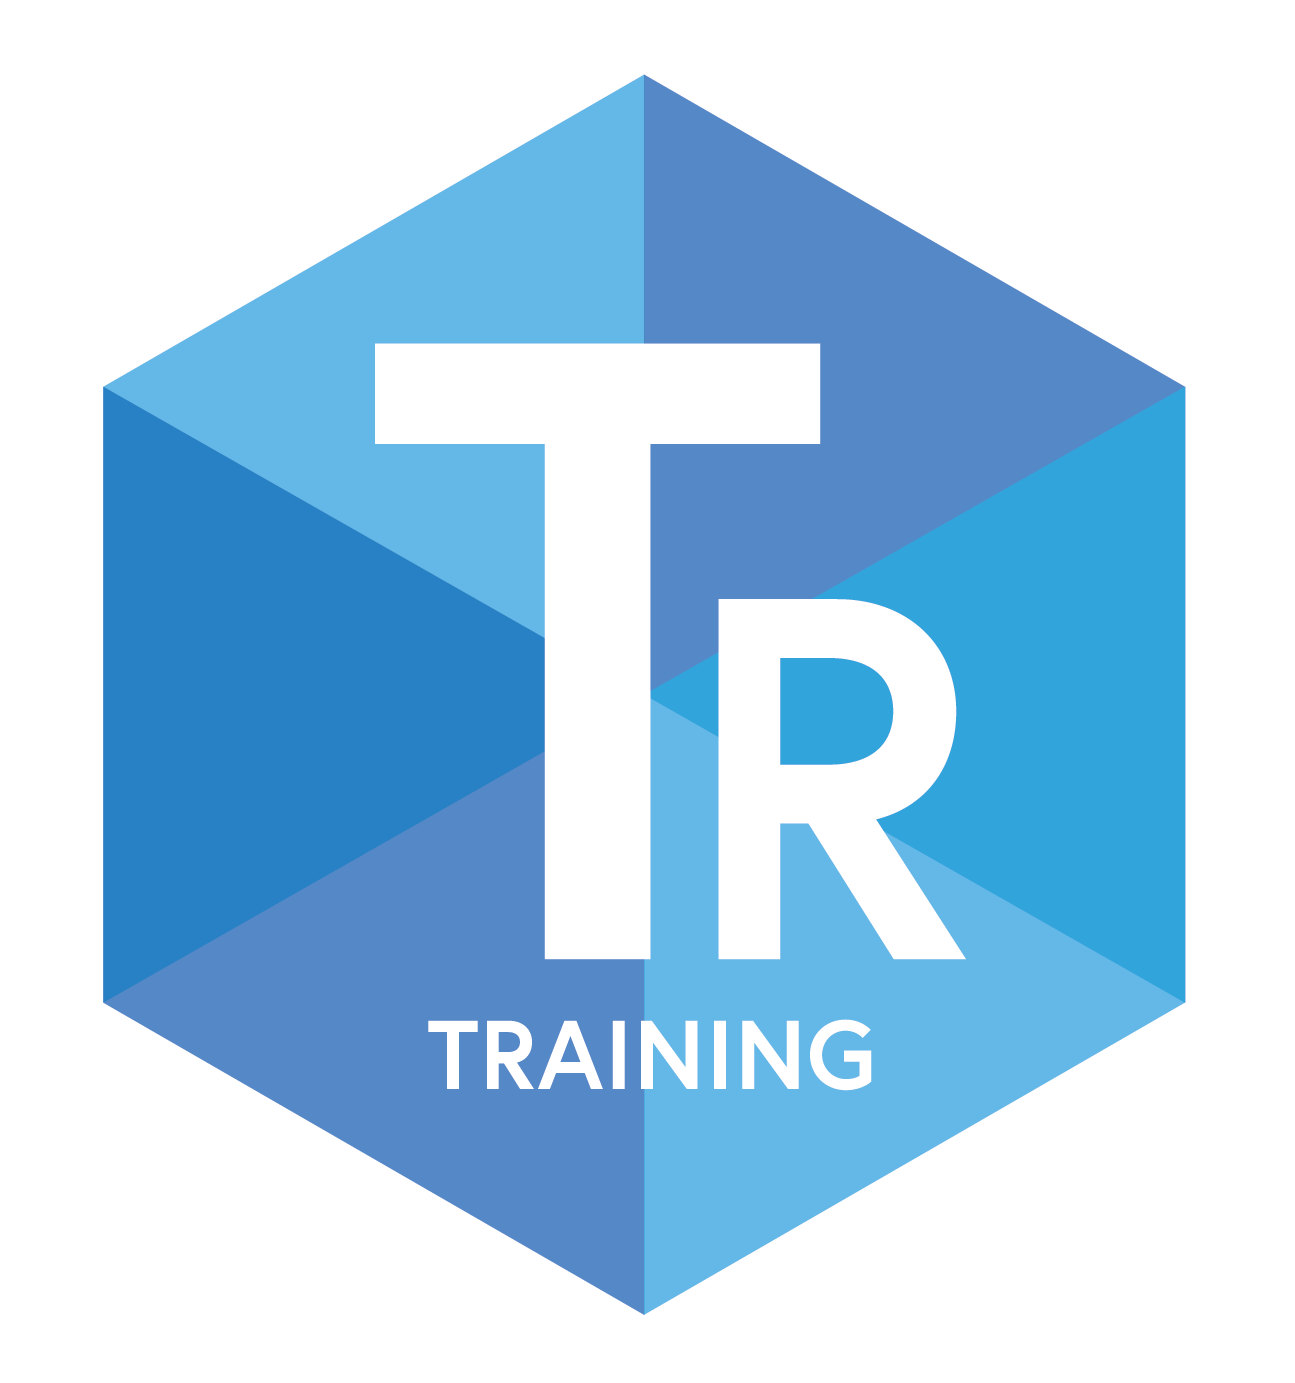 WatchGuard Training and Certification